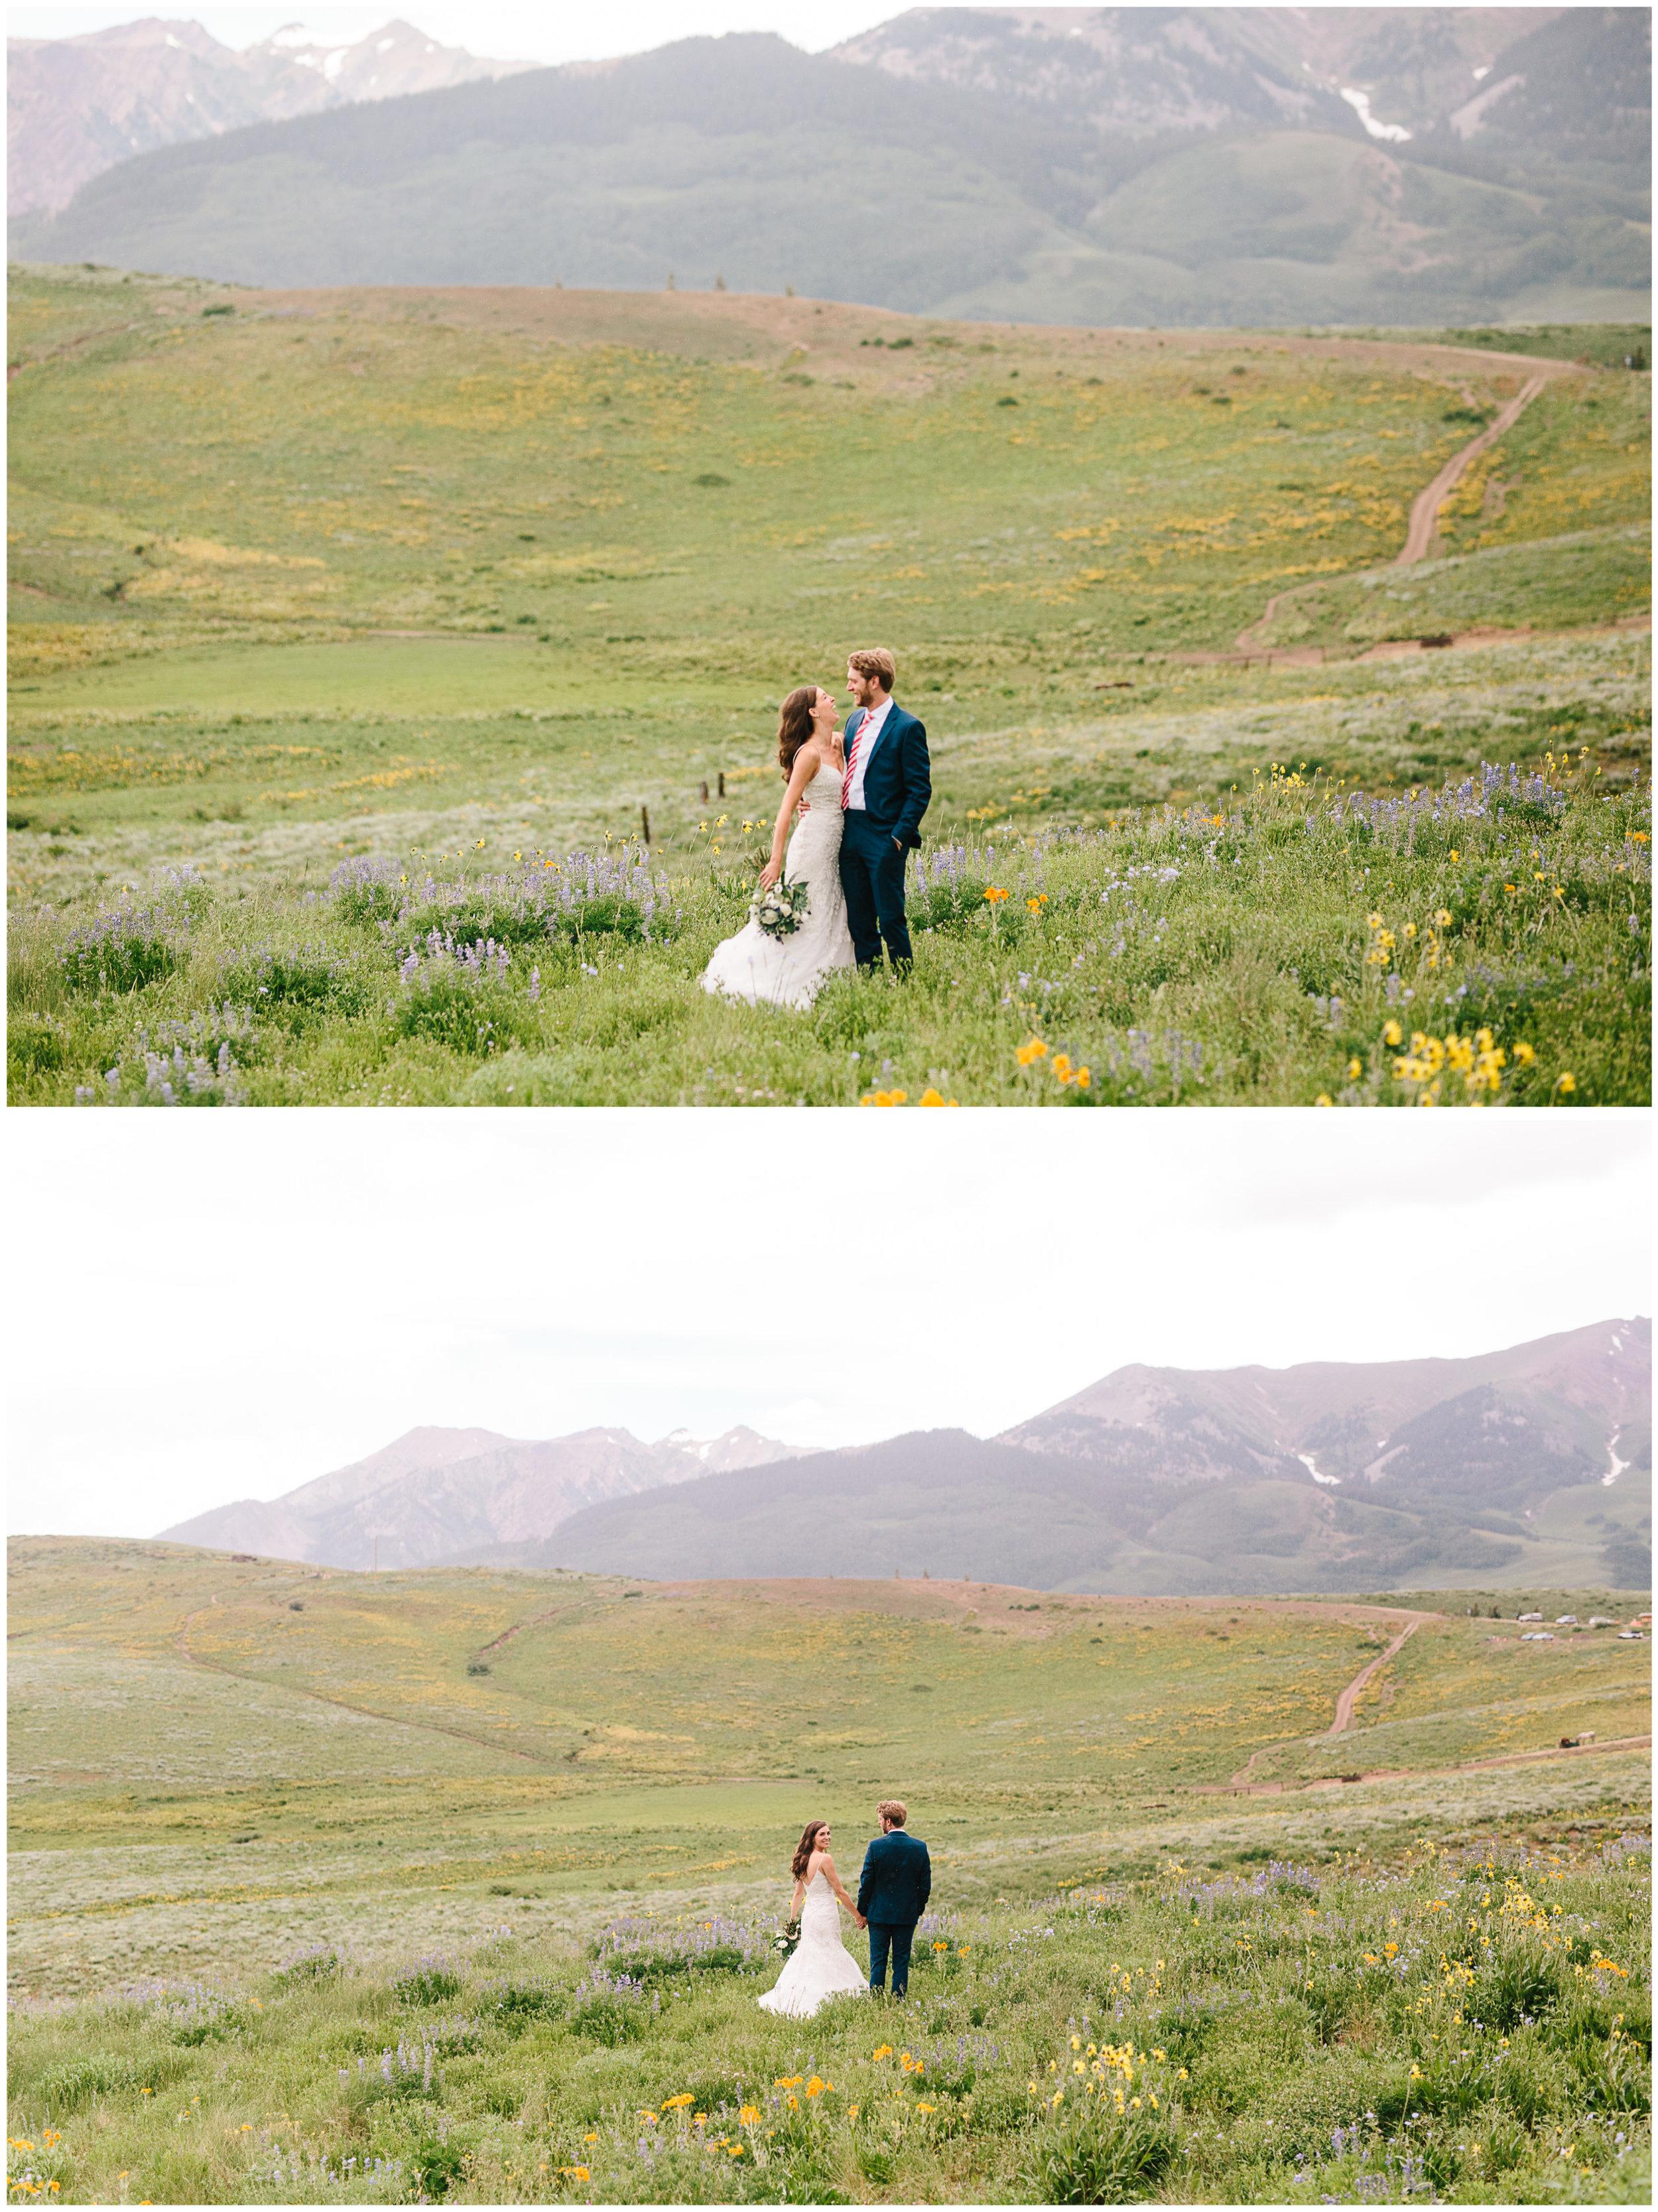 crested_butte_wedding_47.jpg